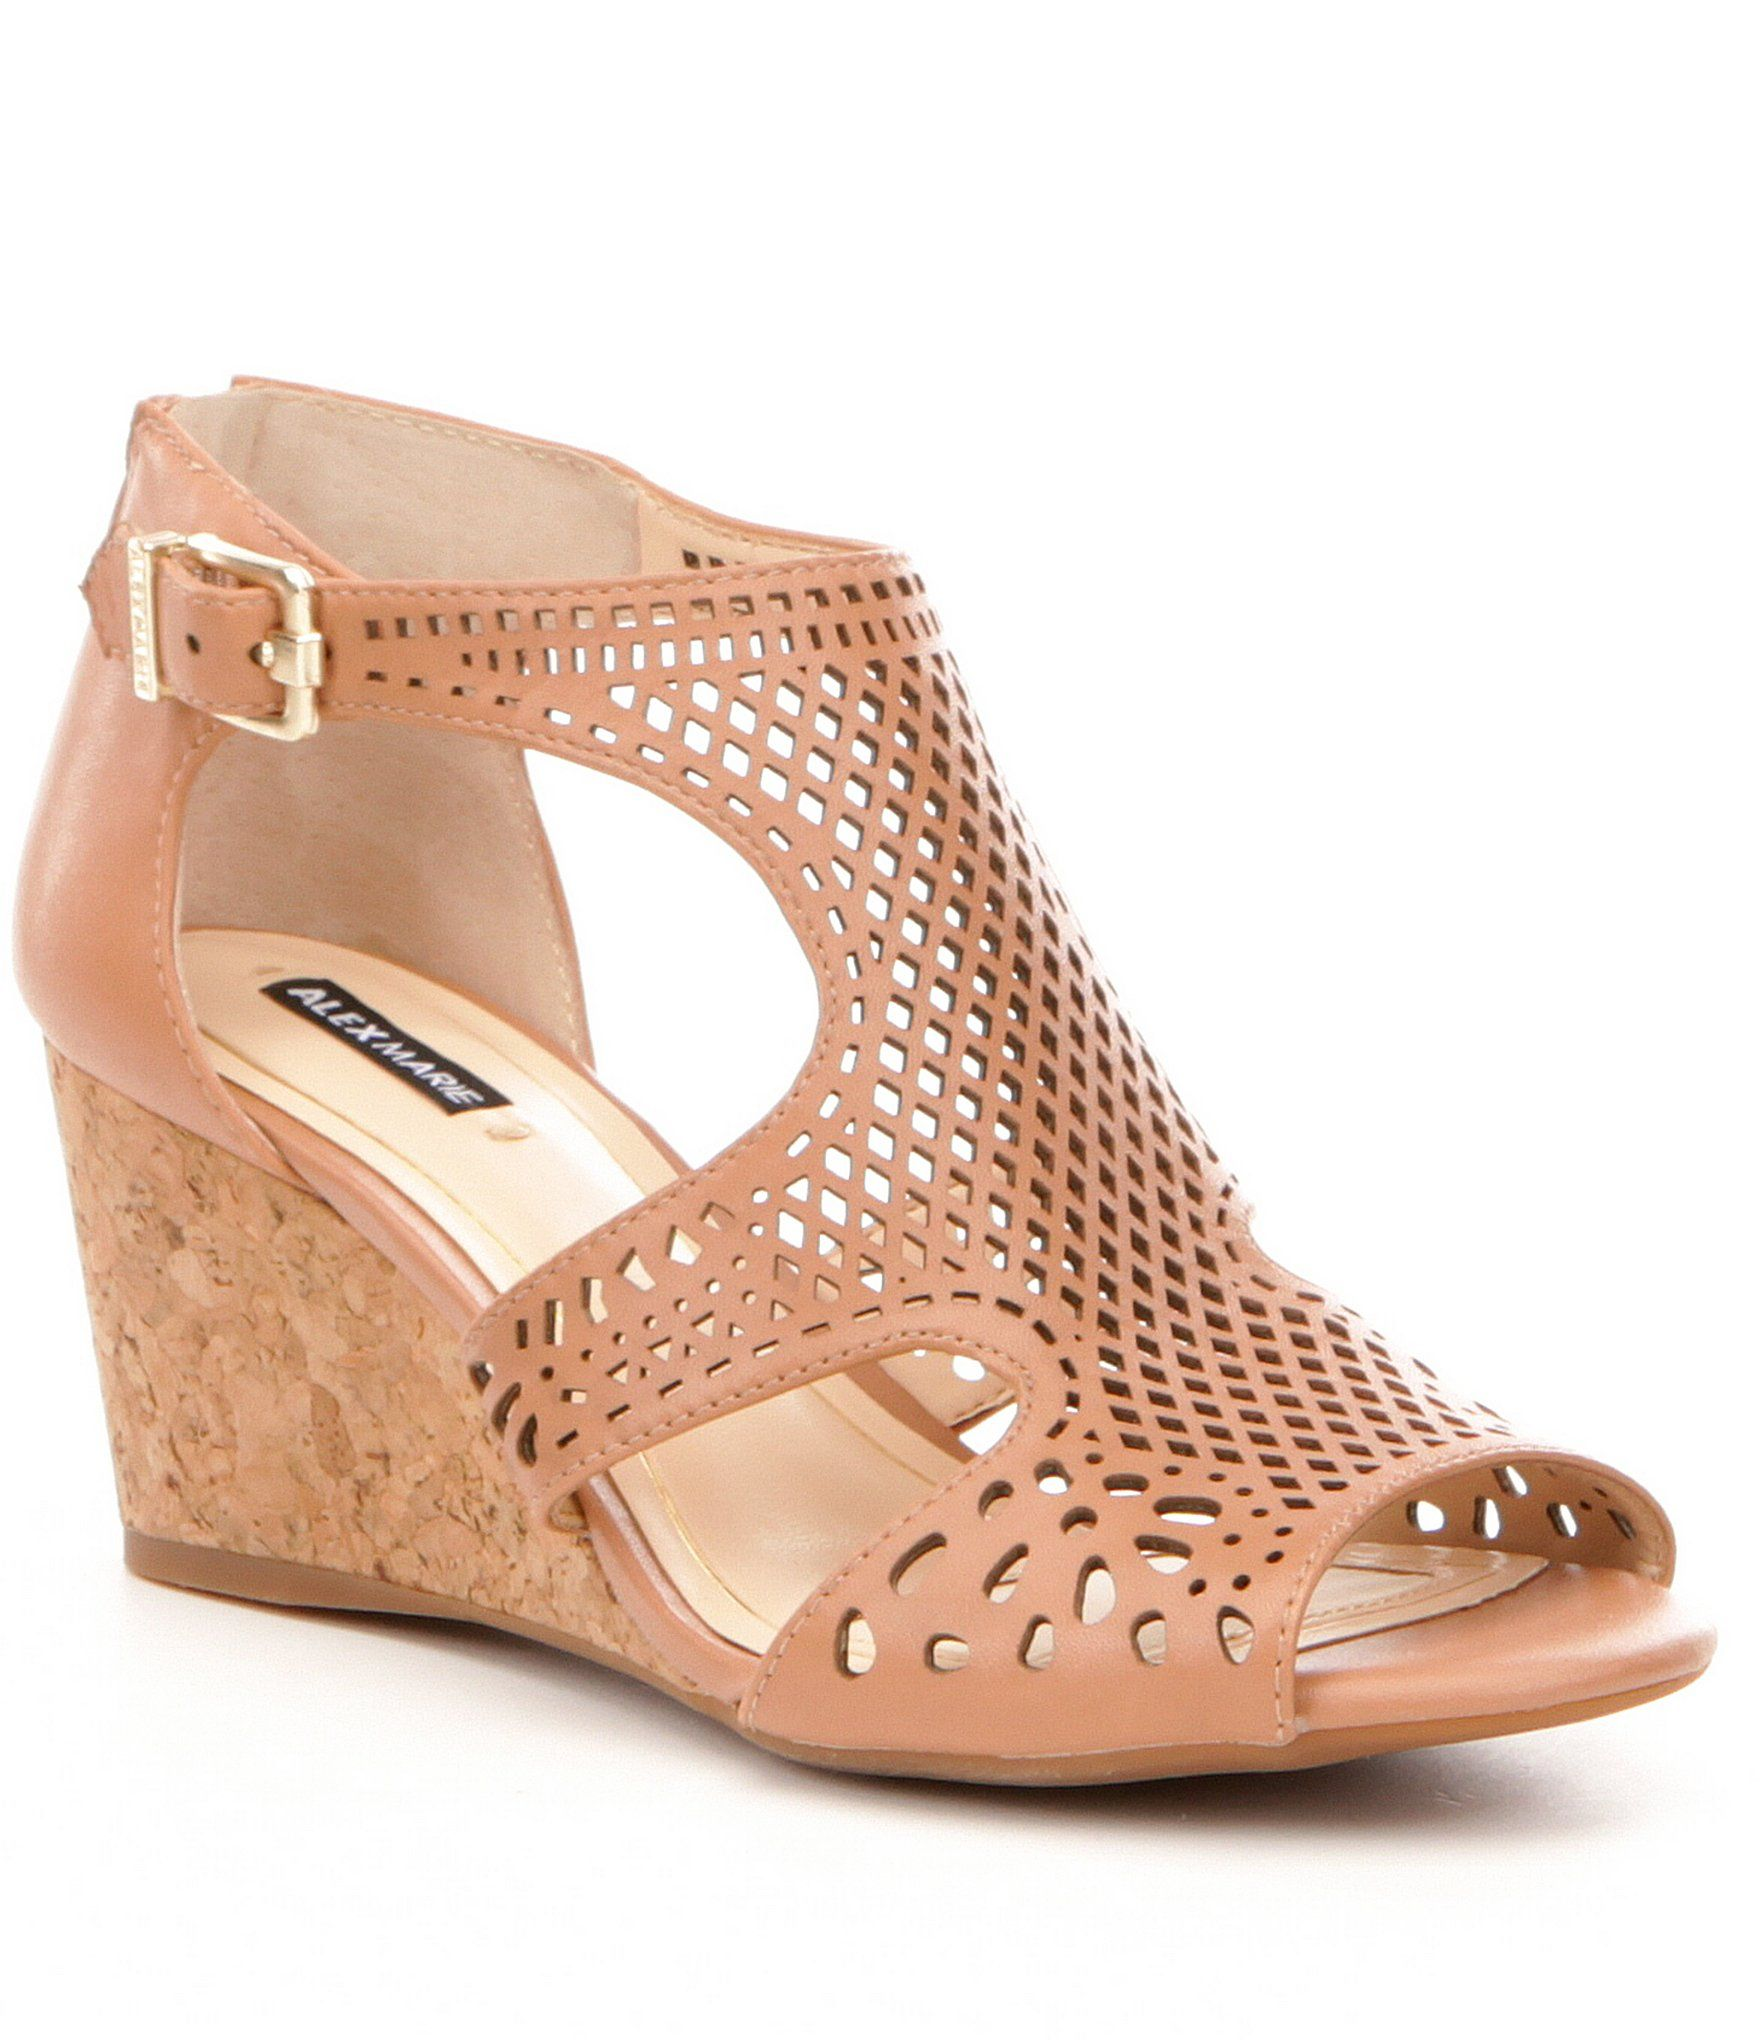 Alex Marie Maxyne Cork Wedge Sandals | Dillards